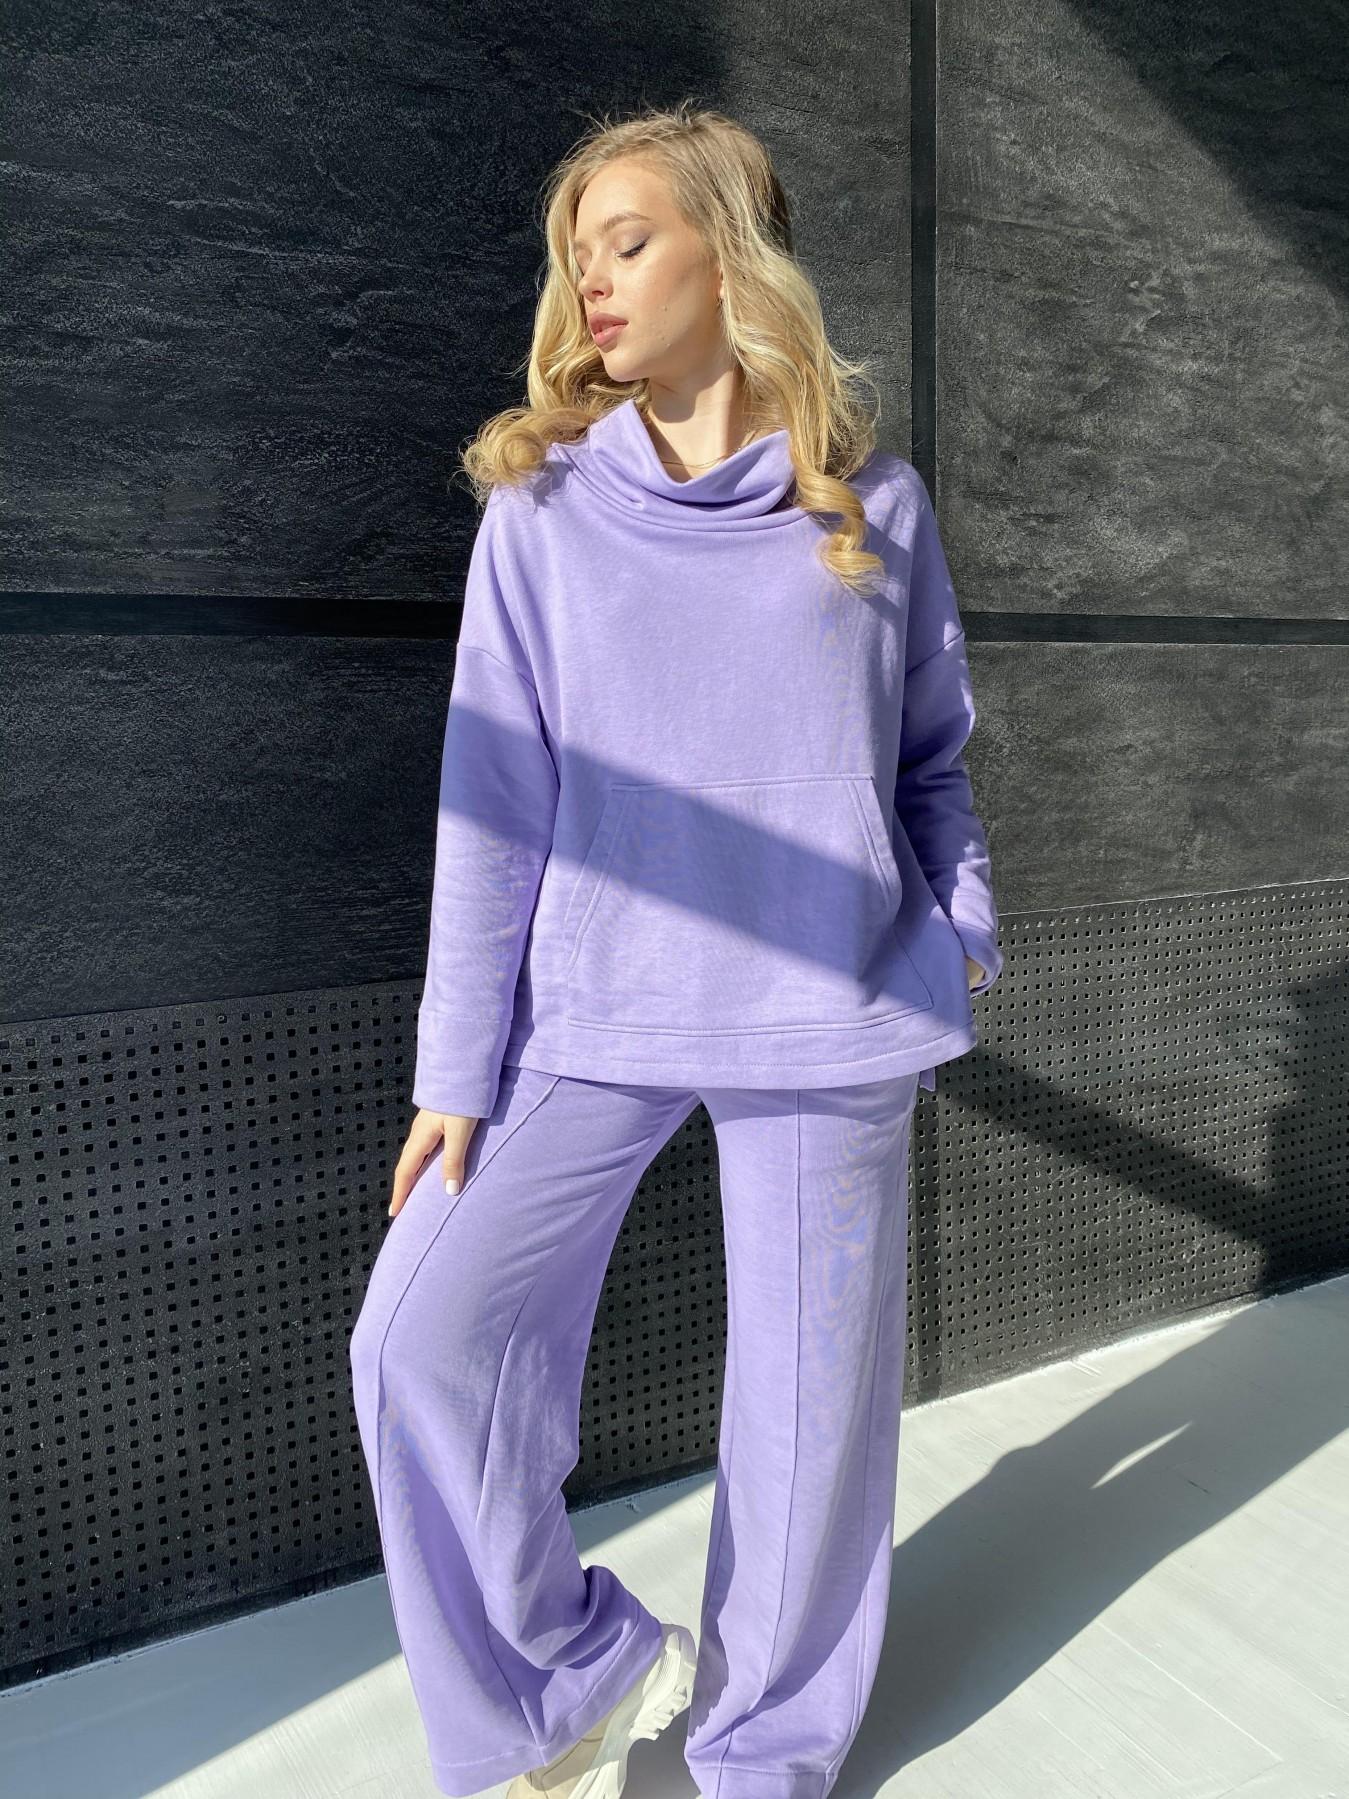 Кристиан костюм 3х нитка 10676 АРТ. 47250 Цвет: Лаванда - фото 3, интернет магазин tm-modus.ru